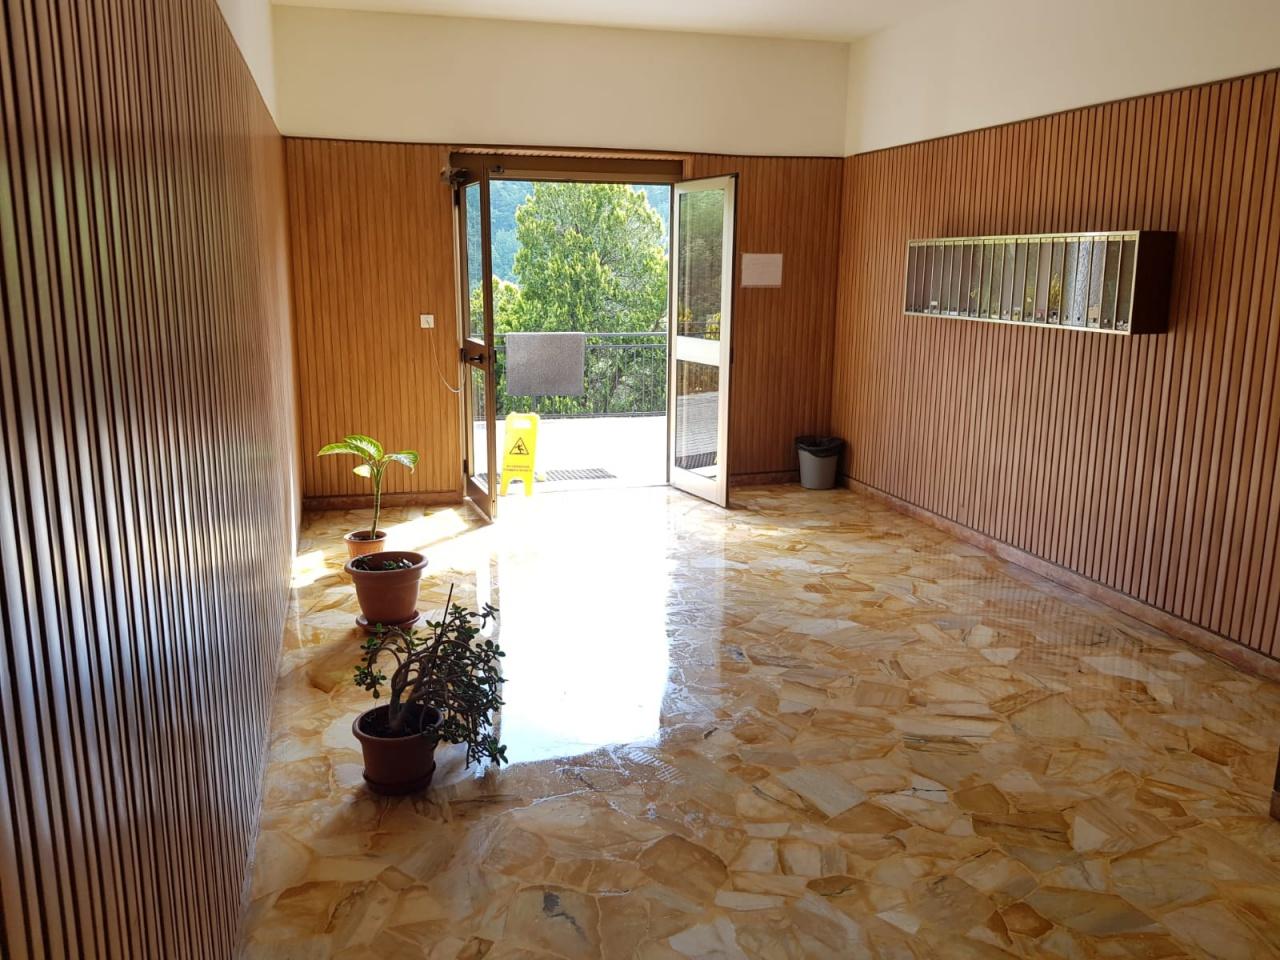 Apartment, via isorelle, Sale - Savignone